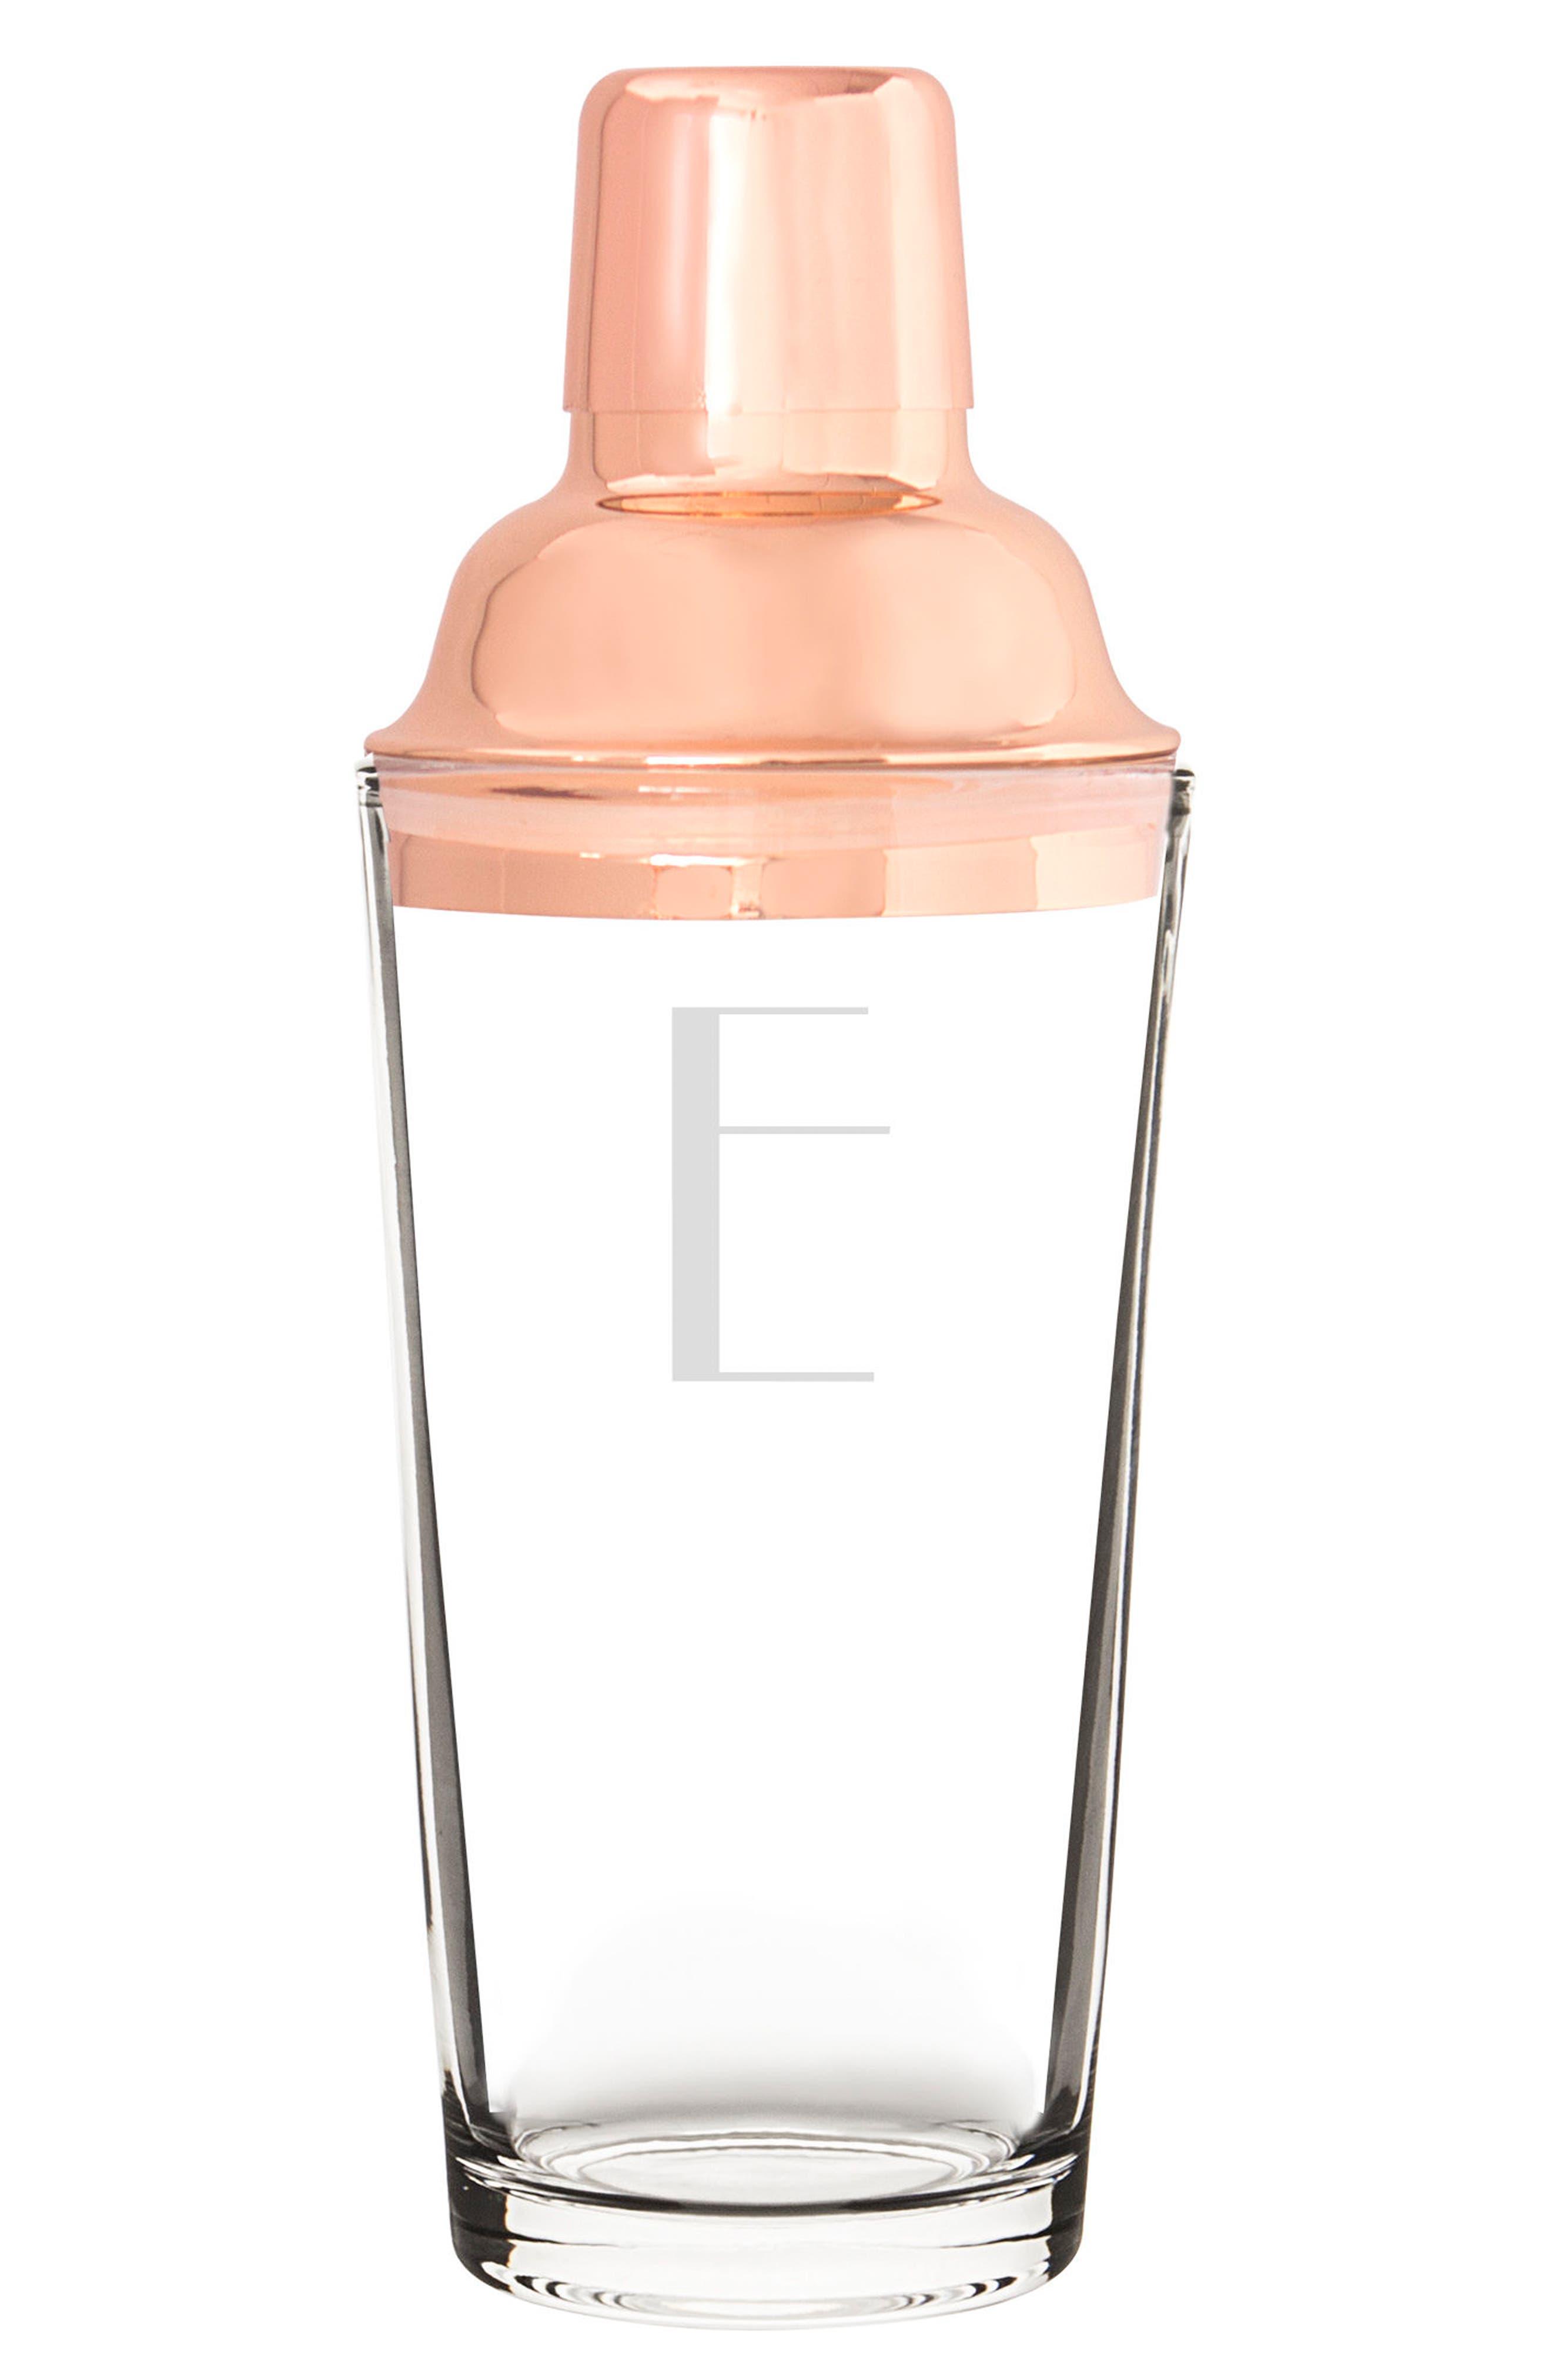 Monogram Coppertone Cocktail Shaker,                             Main thumbnail 6, color,